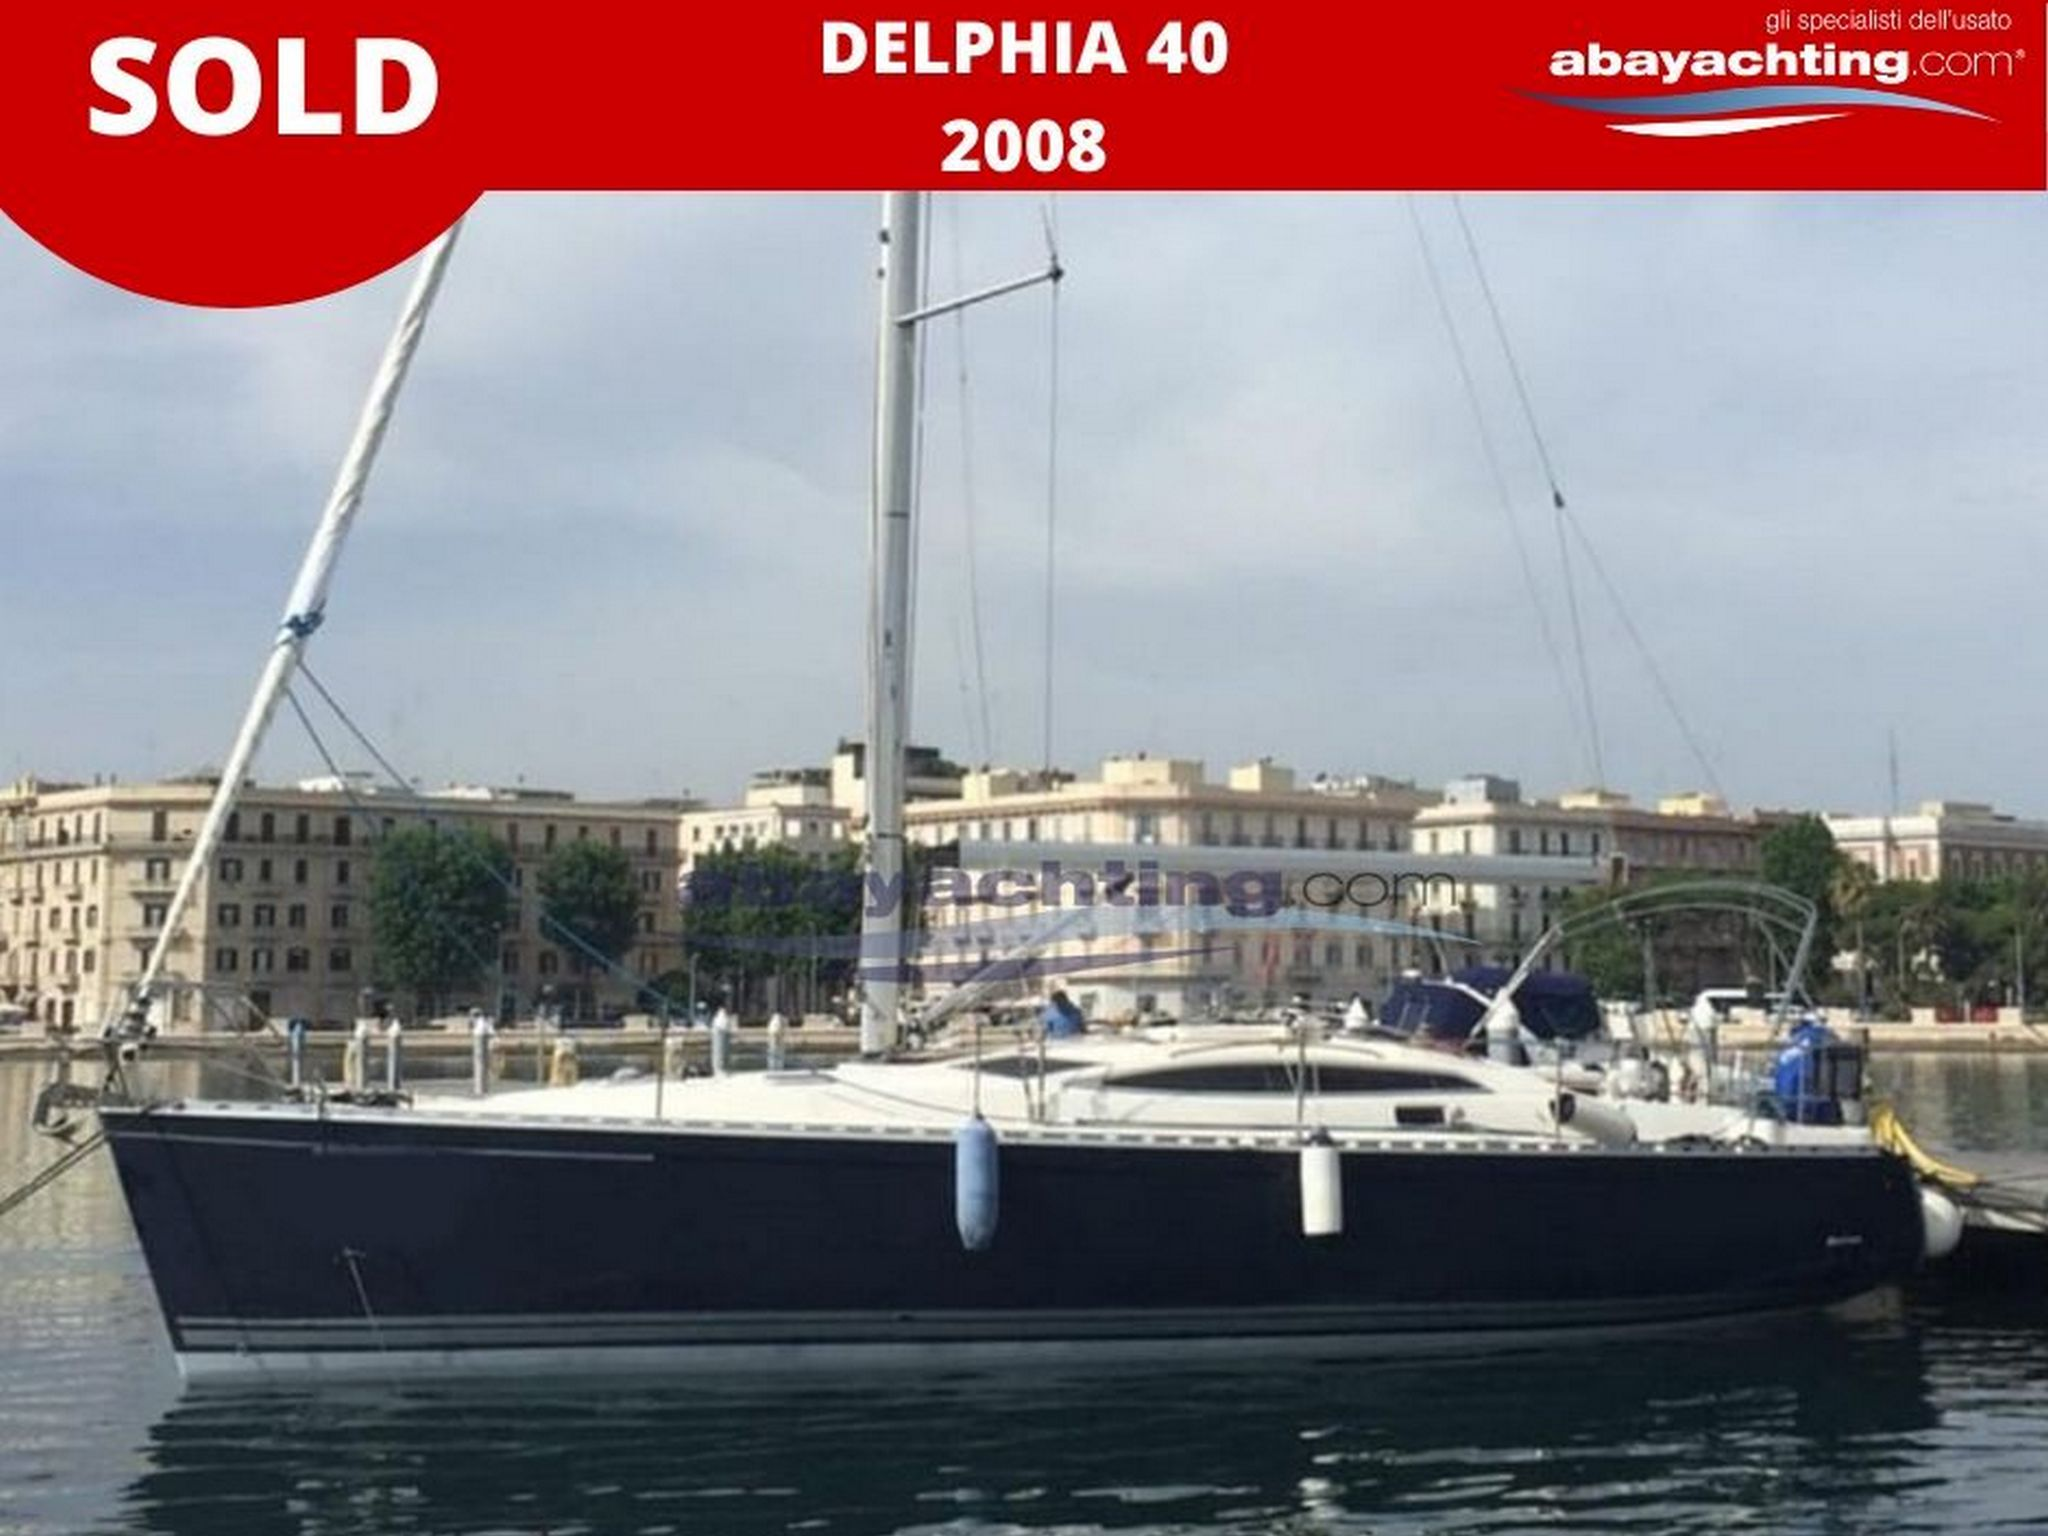 Delphia 40 vendu